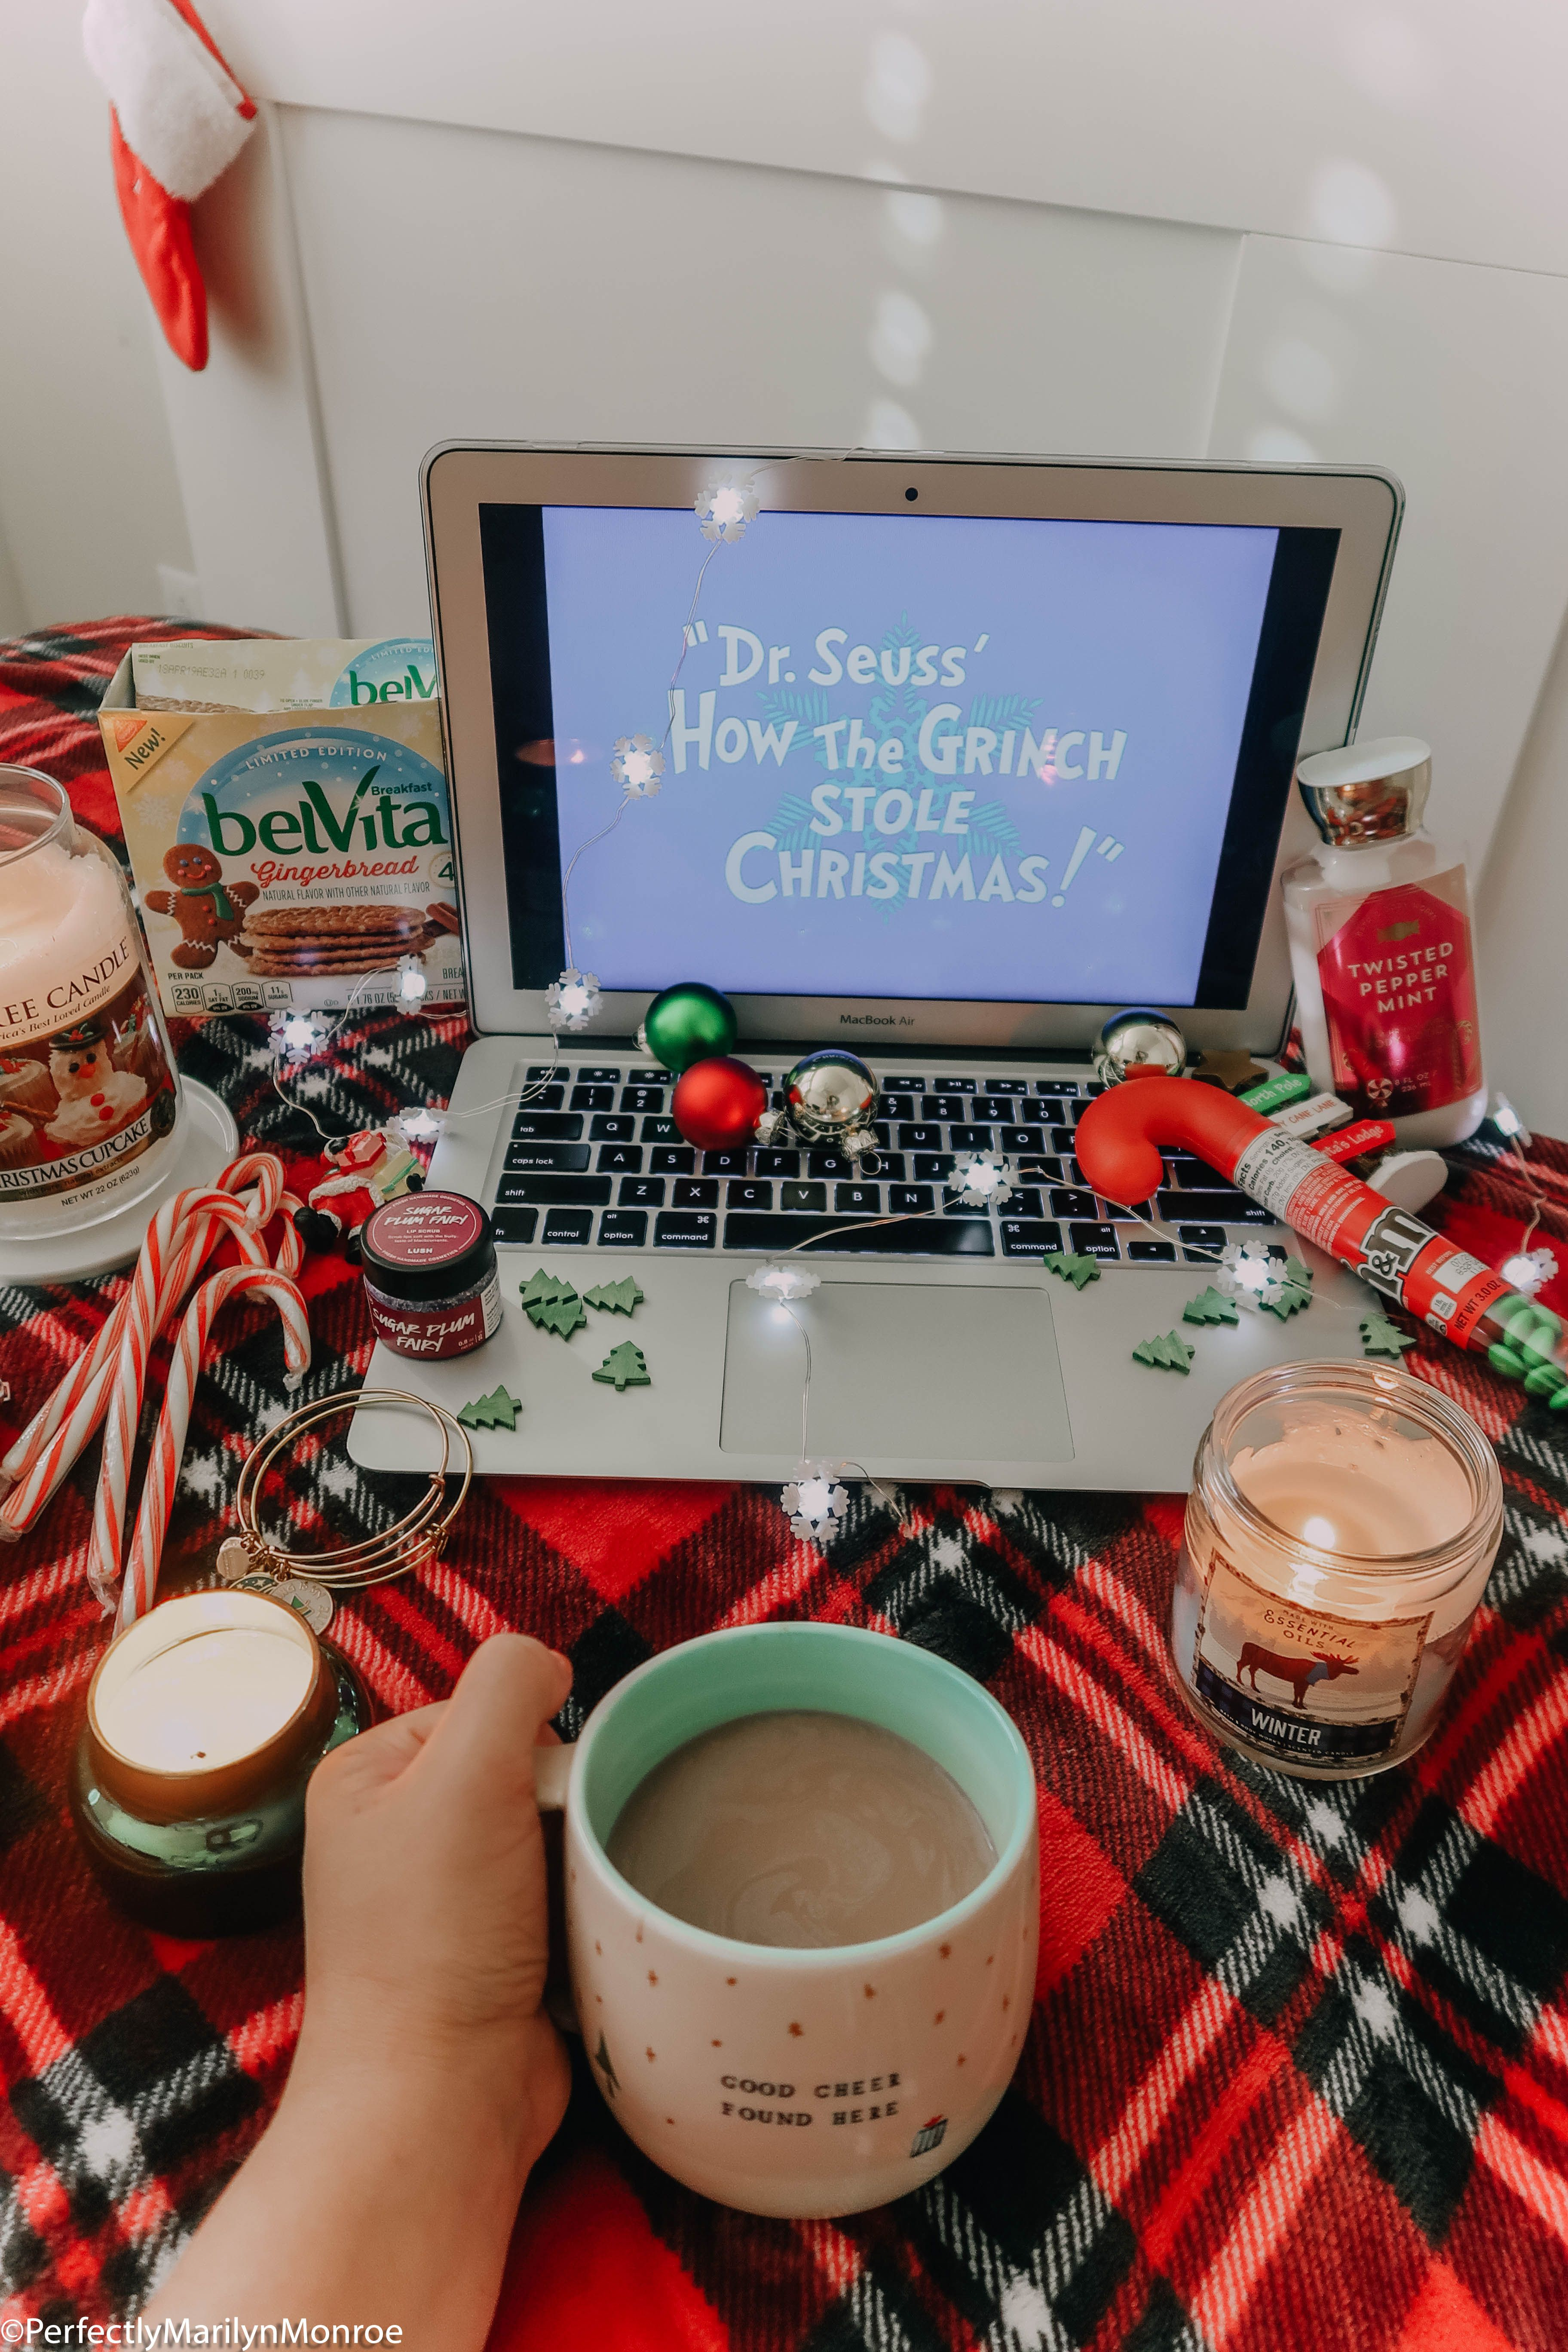 Happy Holidays // #christmas #christmaspictureideas #christmasdecor #cutechristmaspictures #cutechristmaspicturideas #homedecor #decor #christmasdecorations #christmastree #santaclause #christmastreeideas #christmascookies #christmascrafts #christmaspartyideas #christmasoutfit #christmasoutfits #christmasmovies #flatlays #christmasflatlay #winter #winterwonderland #ootd #ootdwinter #fashion #cutewinteroutfits #winteroutfitideas #christmas2018 #christmas18 #christmasmovies #santaclause